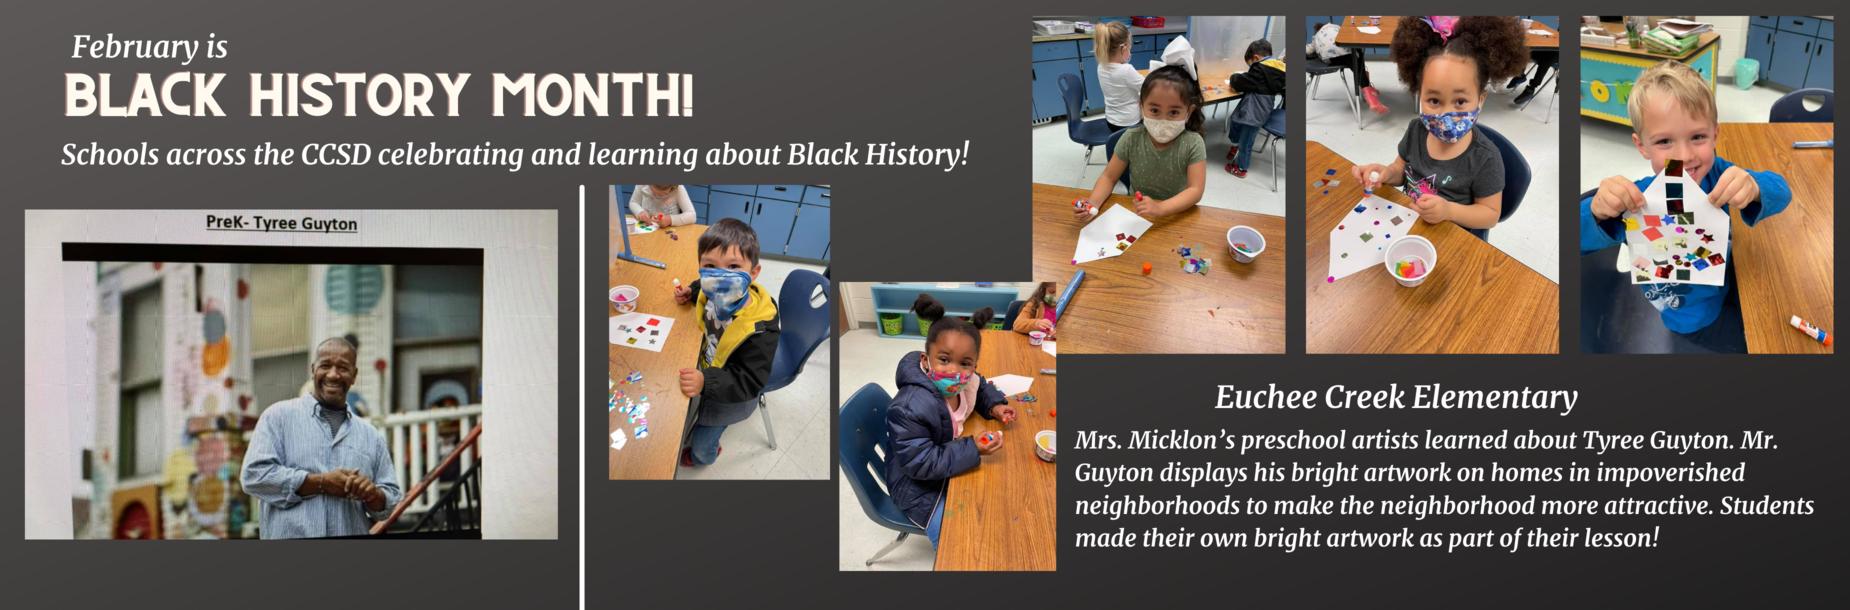 students doing artwork